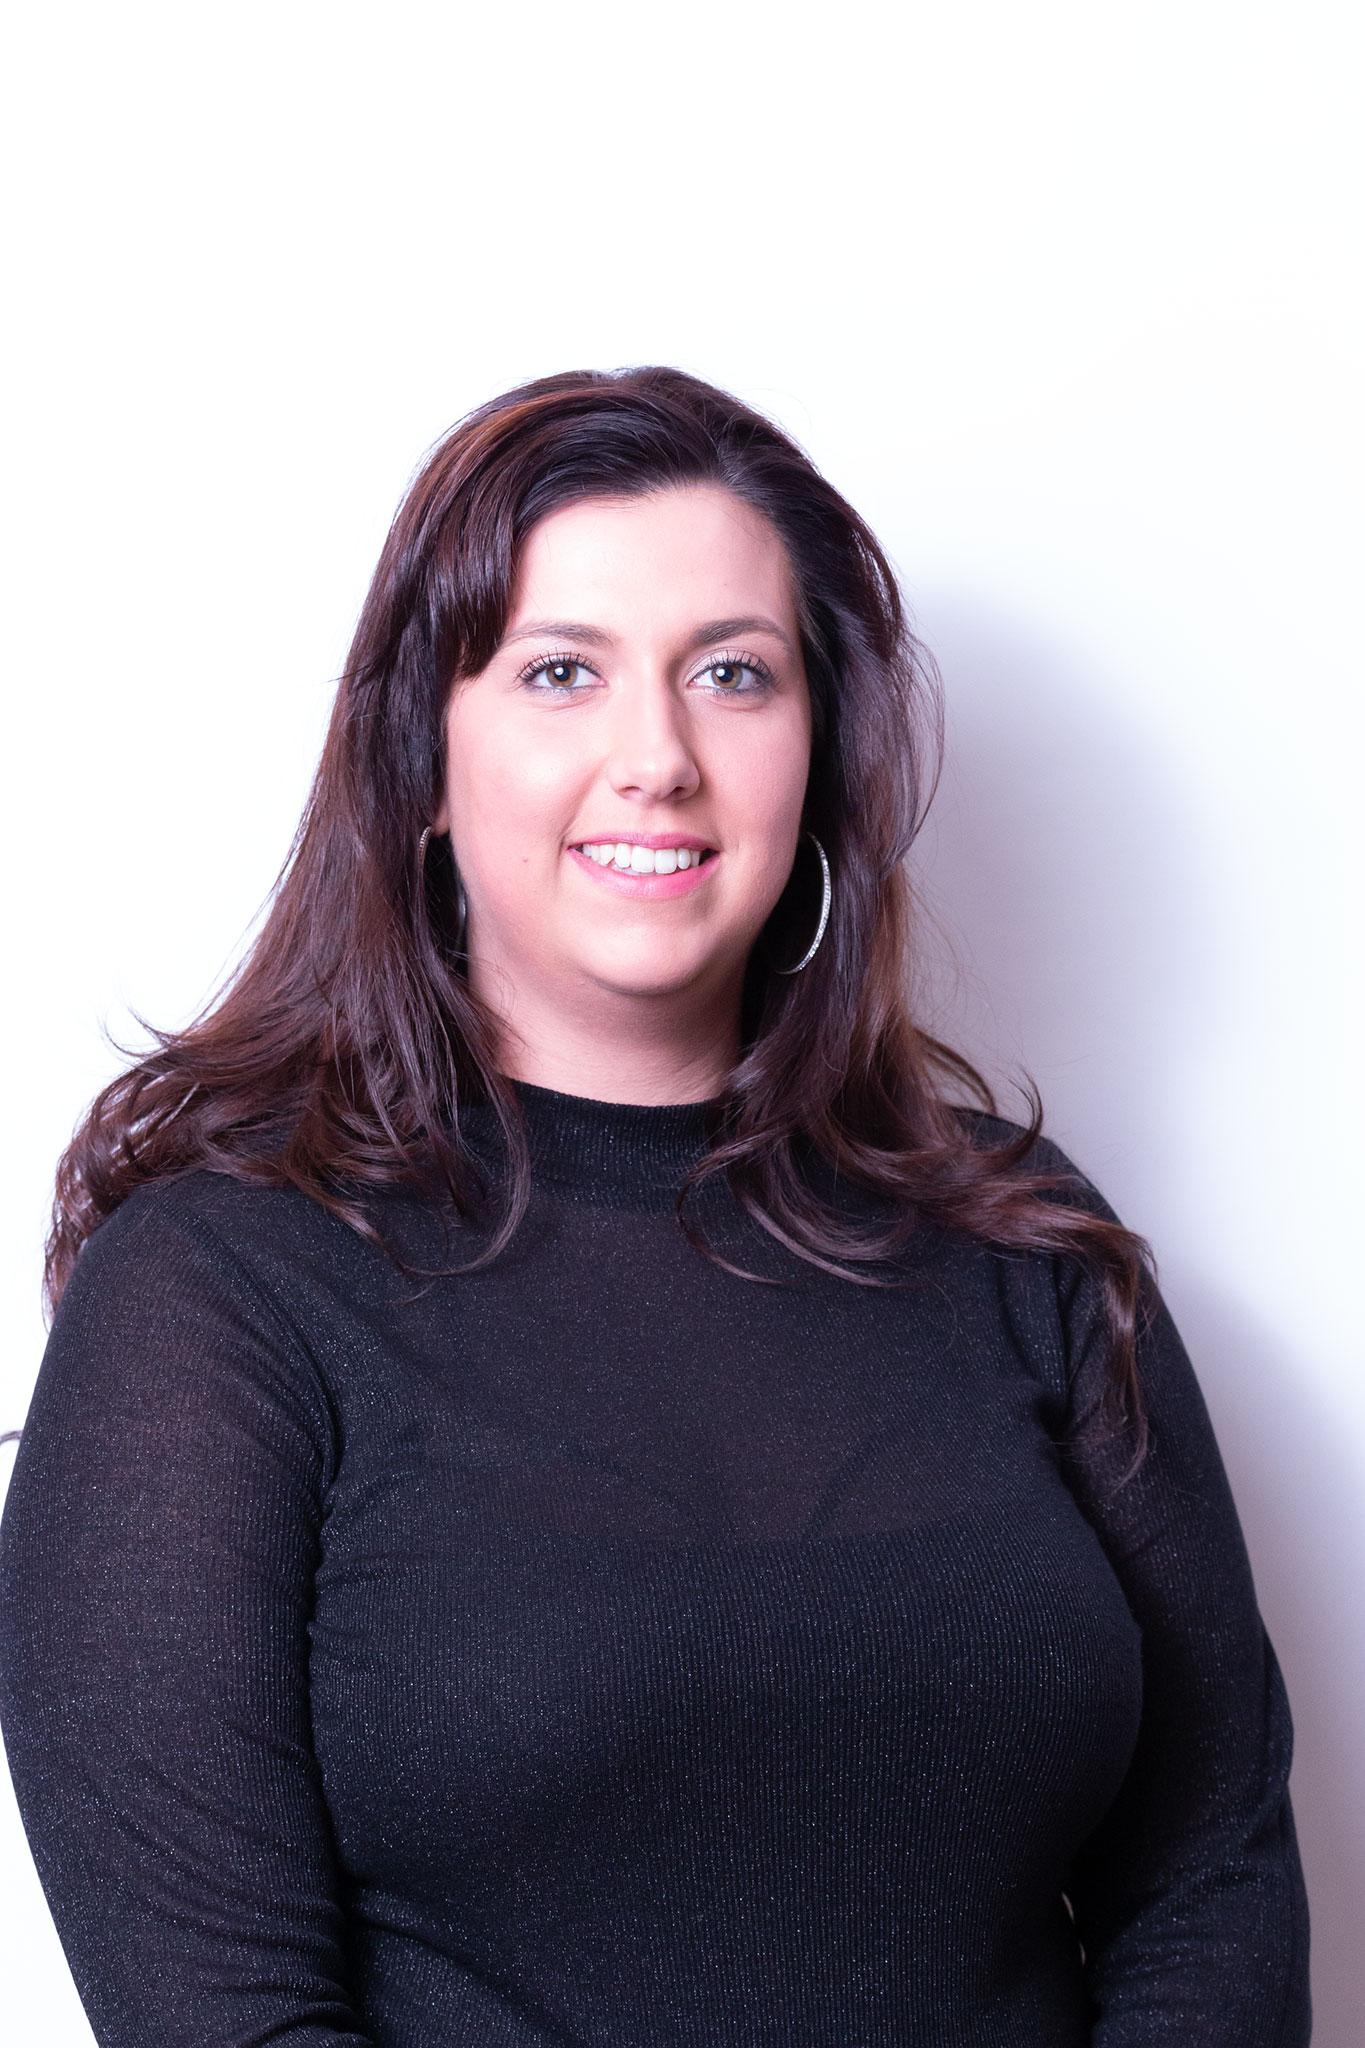 Suzanne - Kapper bij Haarverzorging Den Dolder Den Dolder